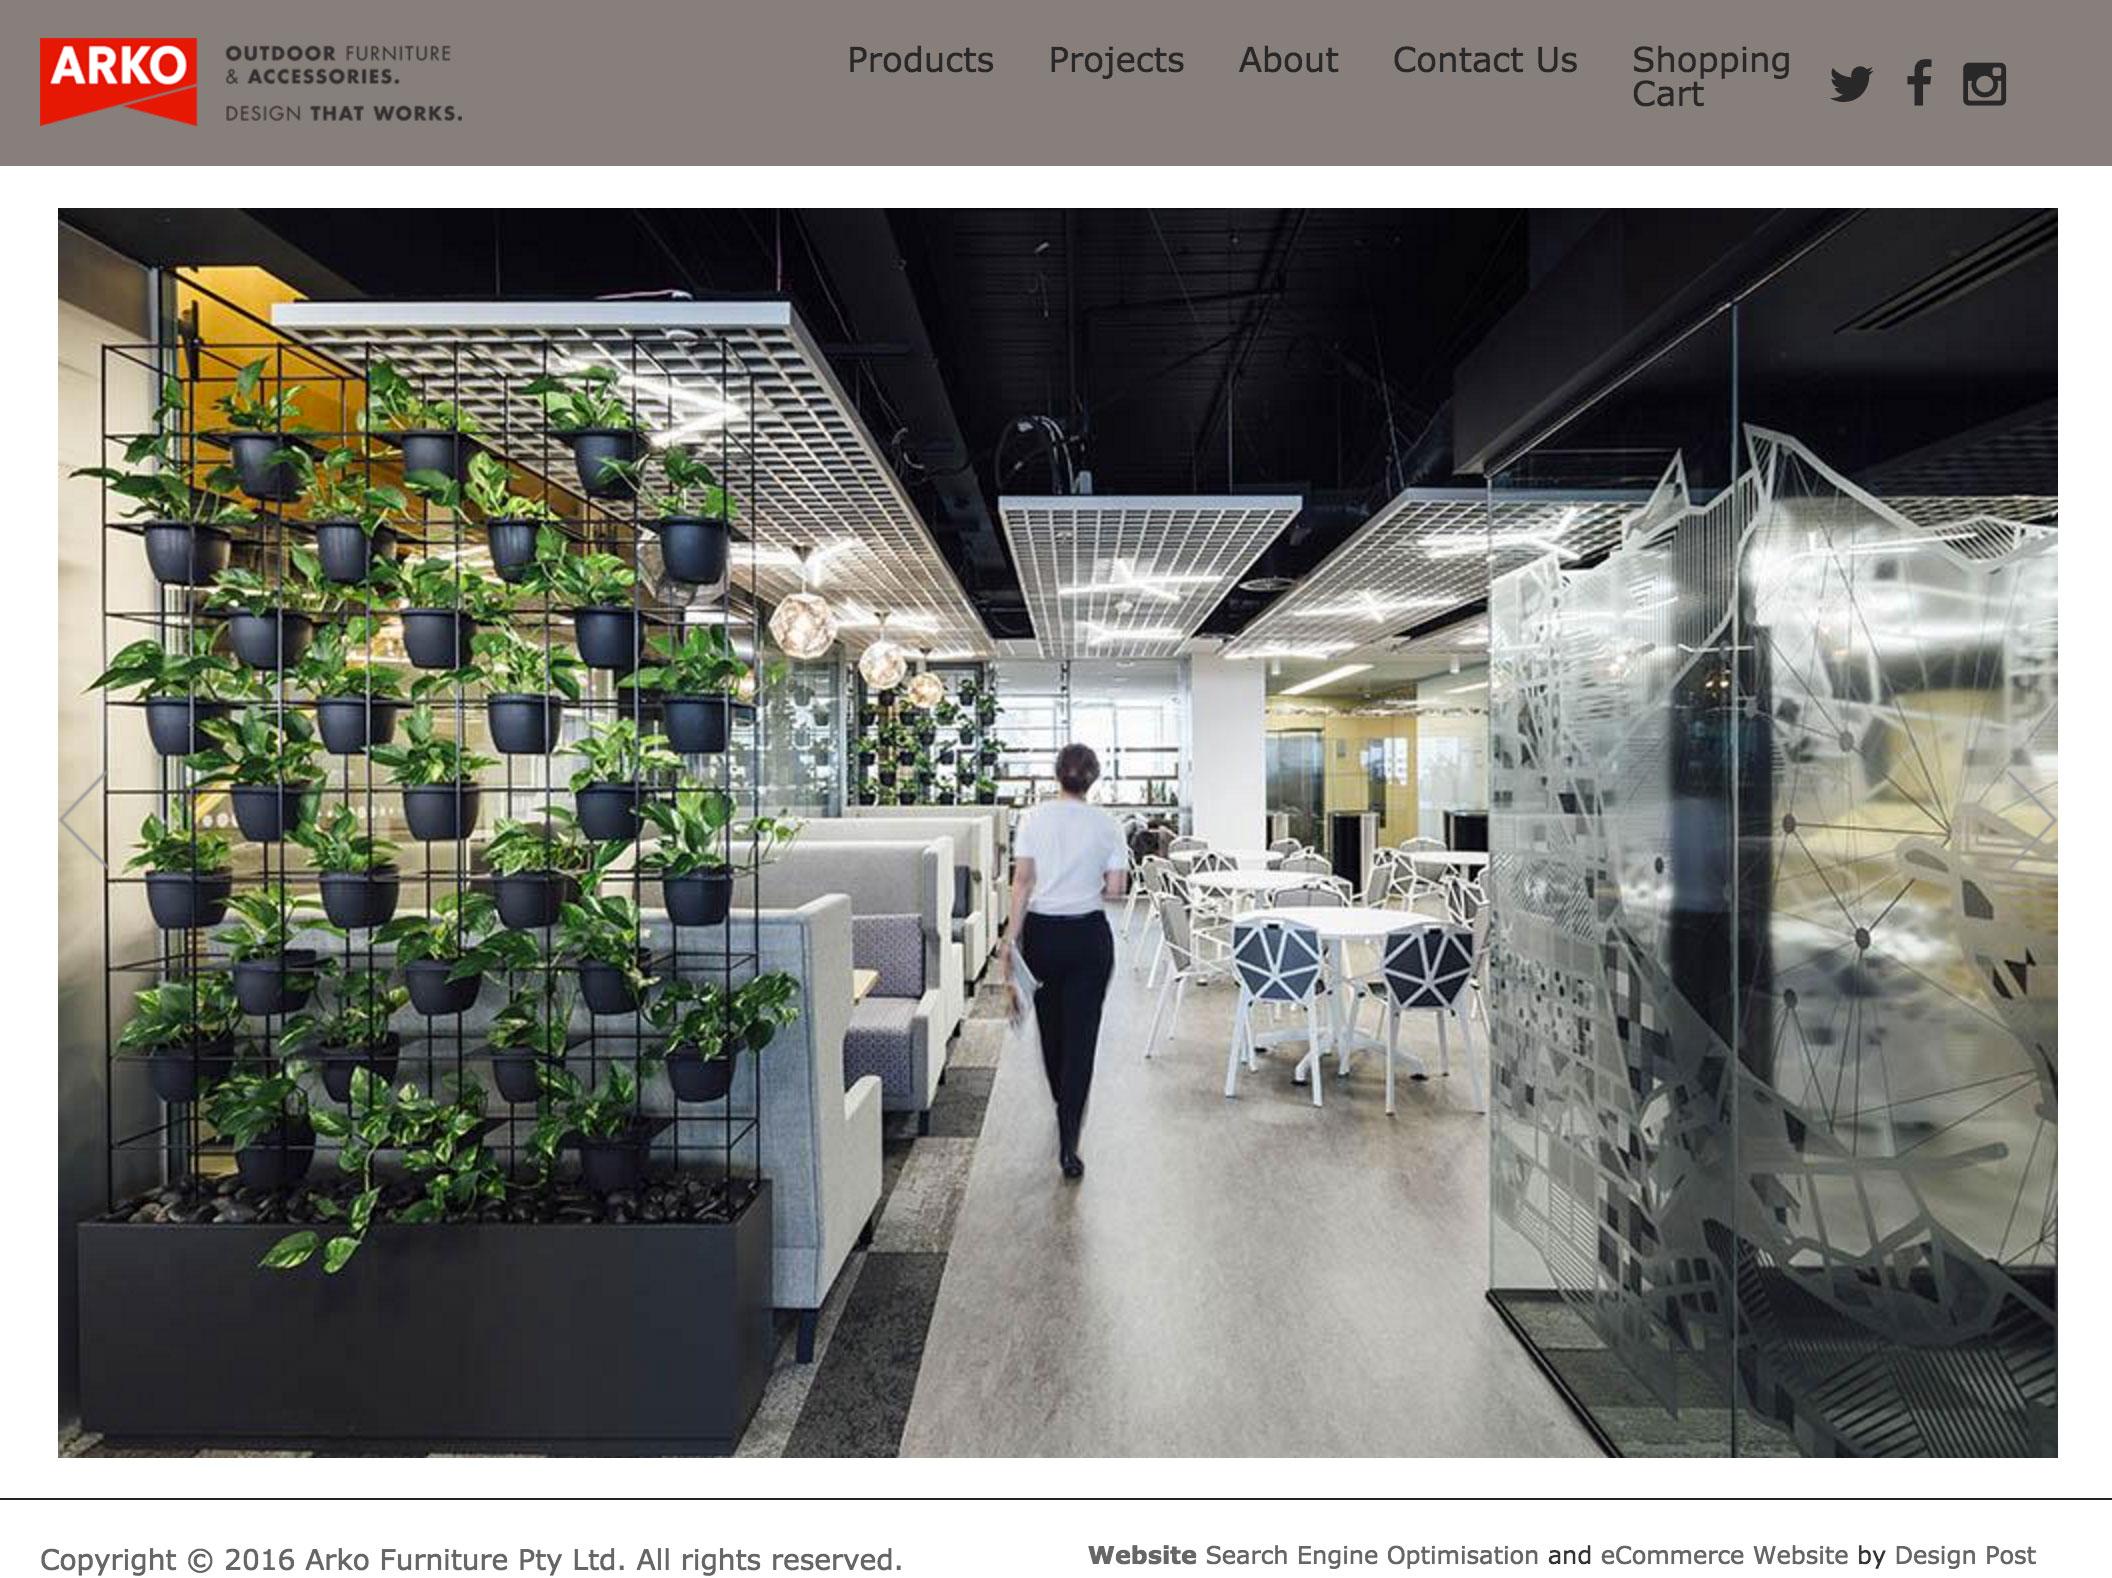 Arko Furniture Home Products Online Shop And Website Design